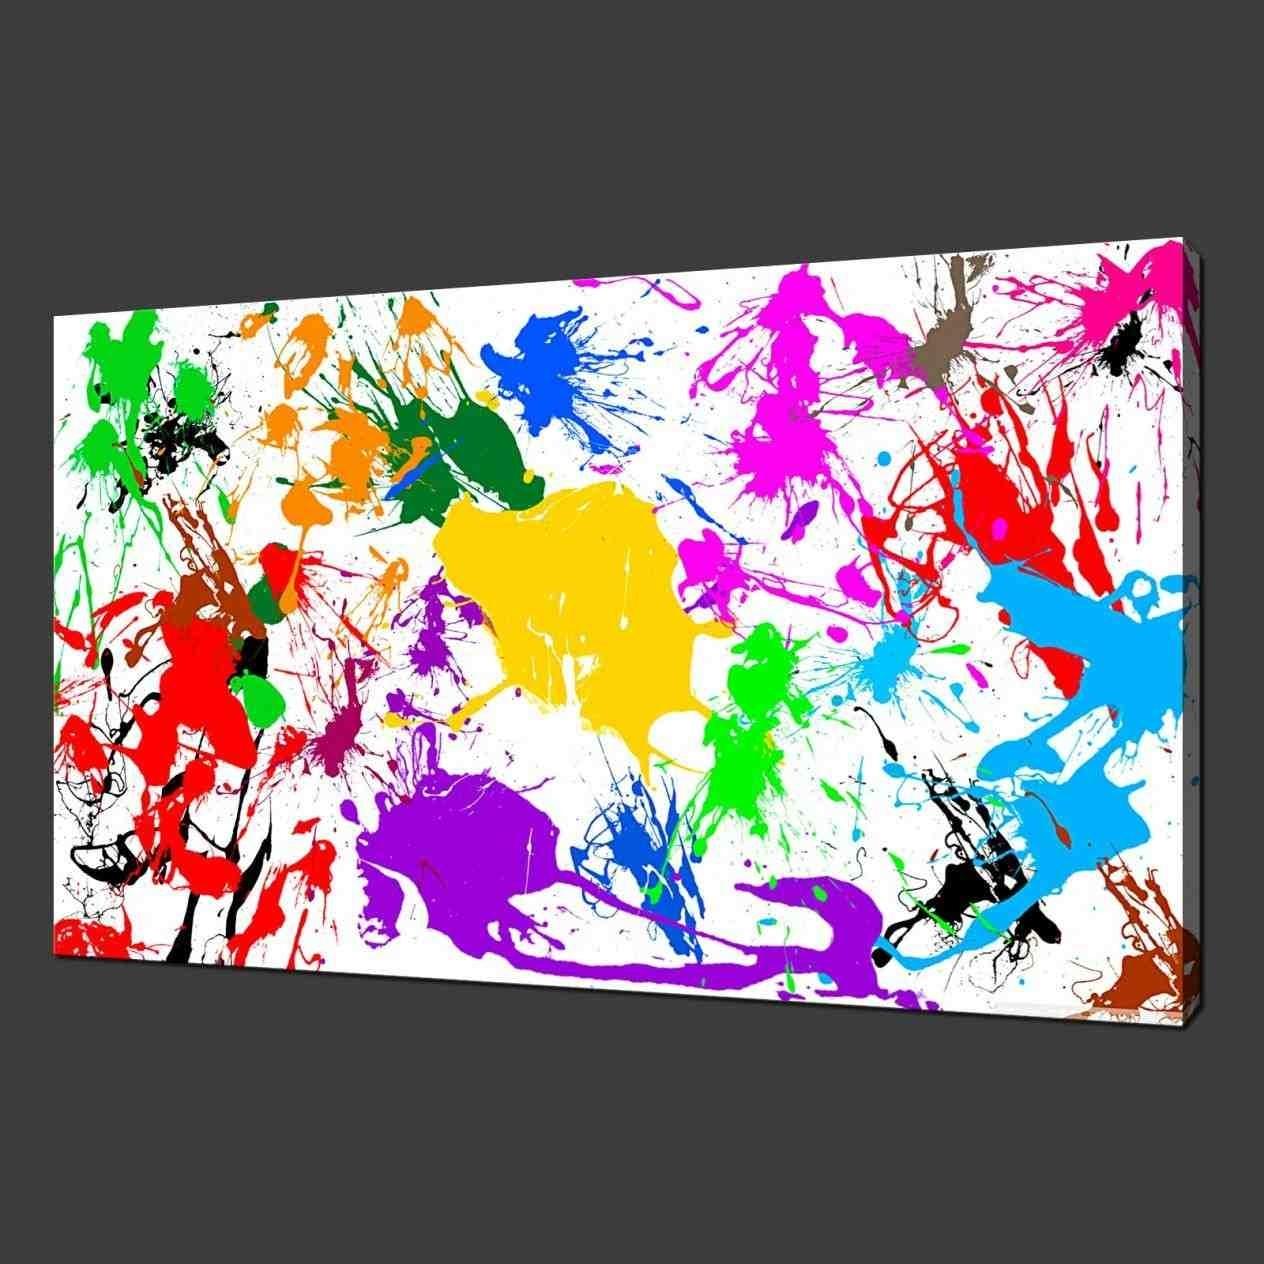 Art Paint Designs – Homedesignlatest (View 7 of 20)